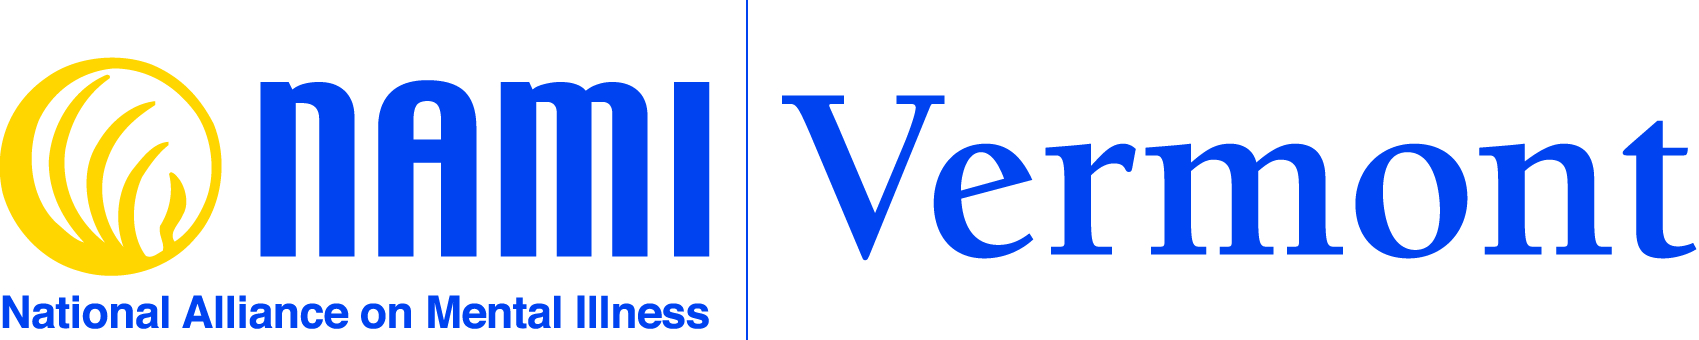 NAMI-VT-Logo.jpg